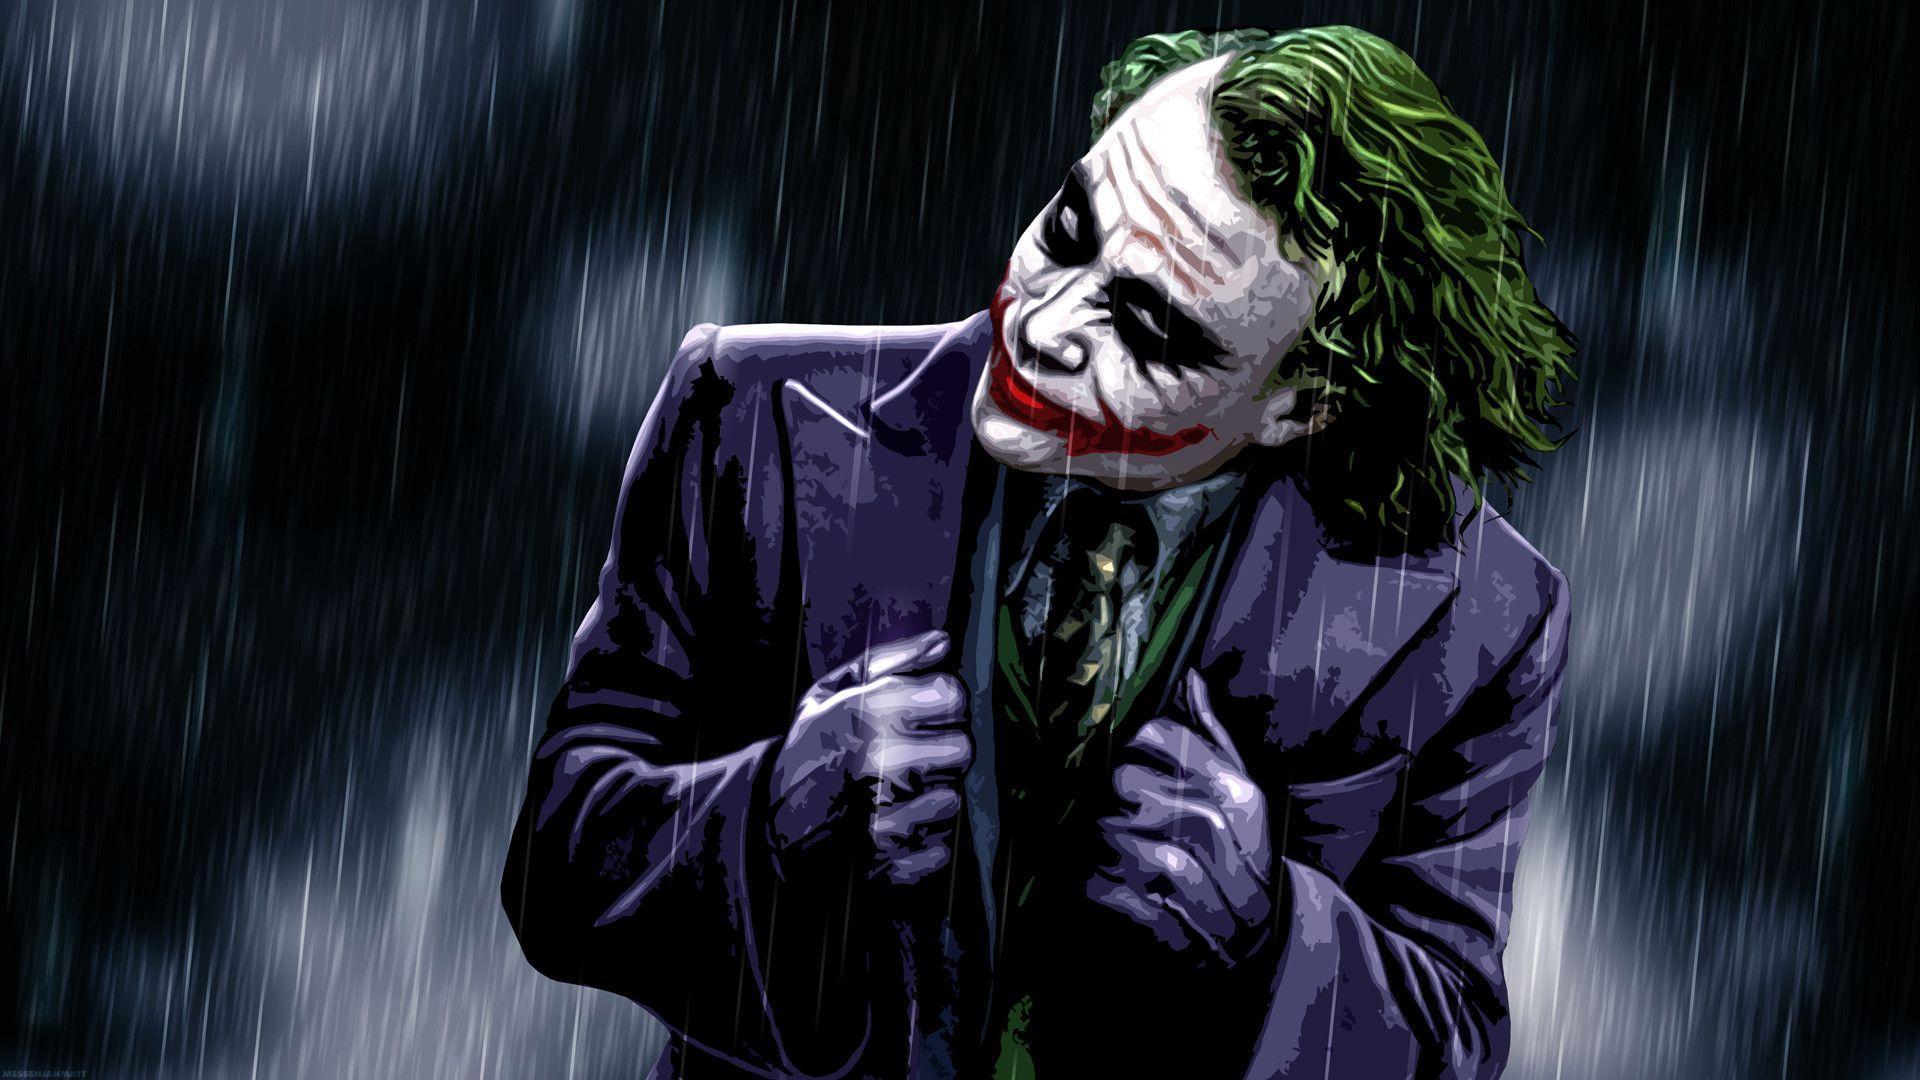 Dark Knight Joker In 4k Ultra Hd Wallpapers Top Free Dark Knight Joker In 4k Ultra Hd Backgrounds Wallpaperaccess